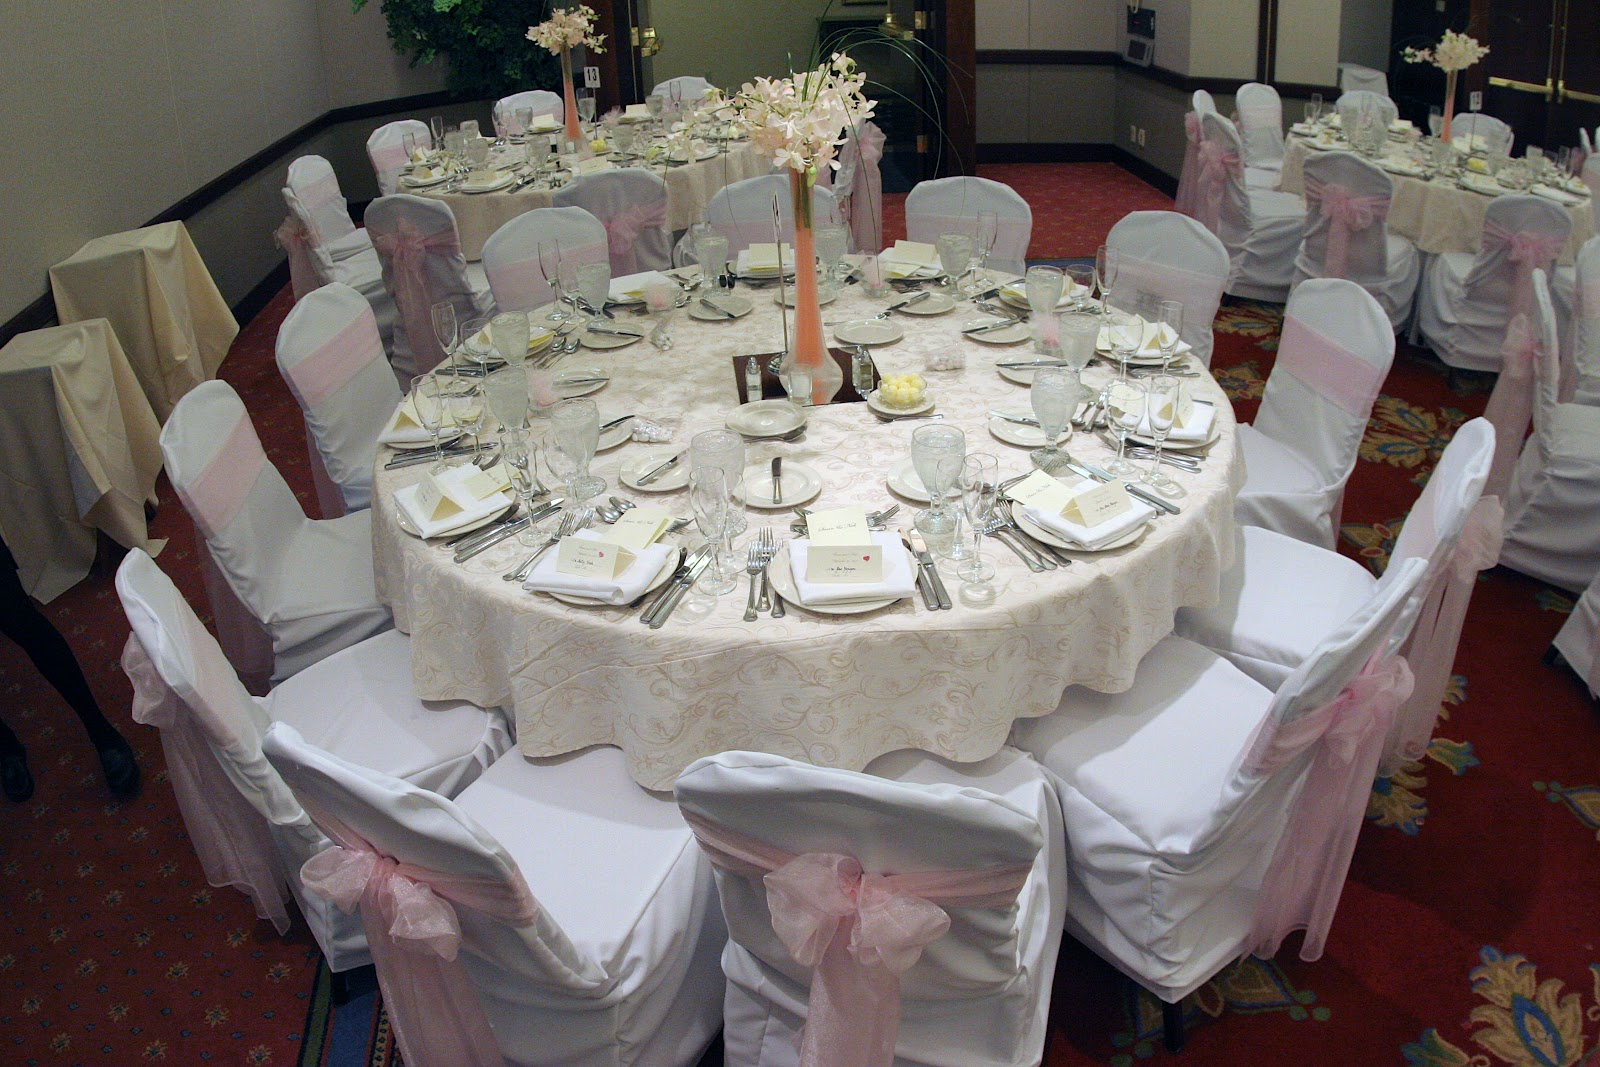 Kinds Of Table Setting : ديكور لترابيزة بقاعة افراح  المرسال